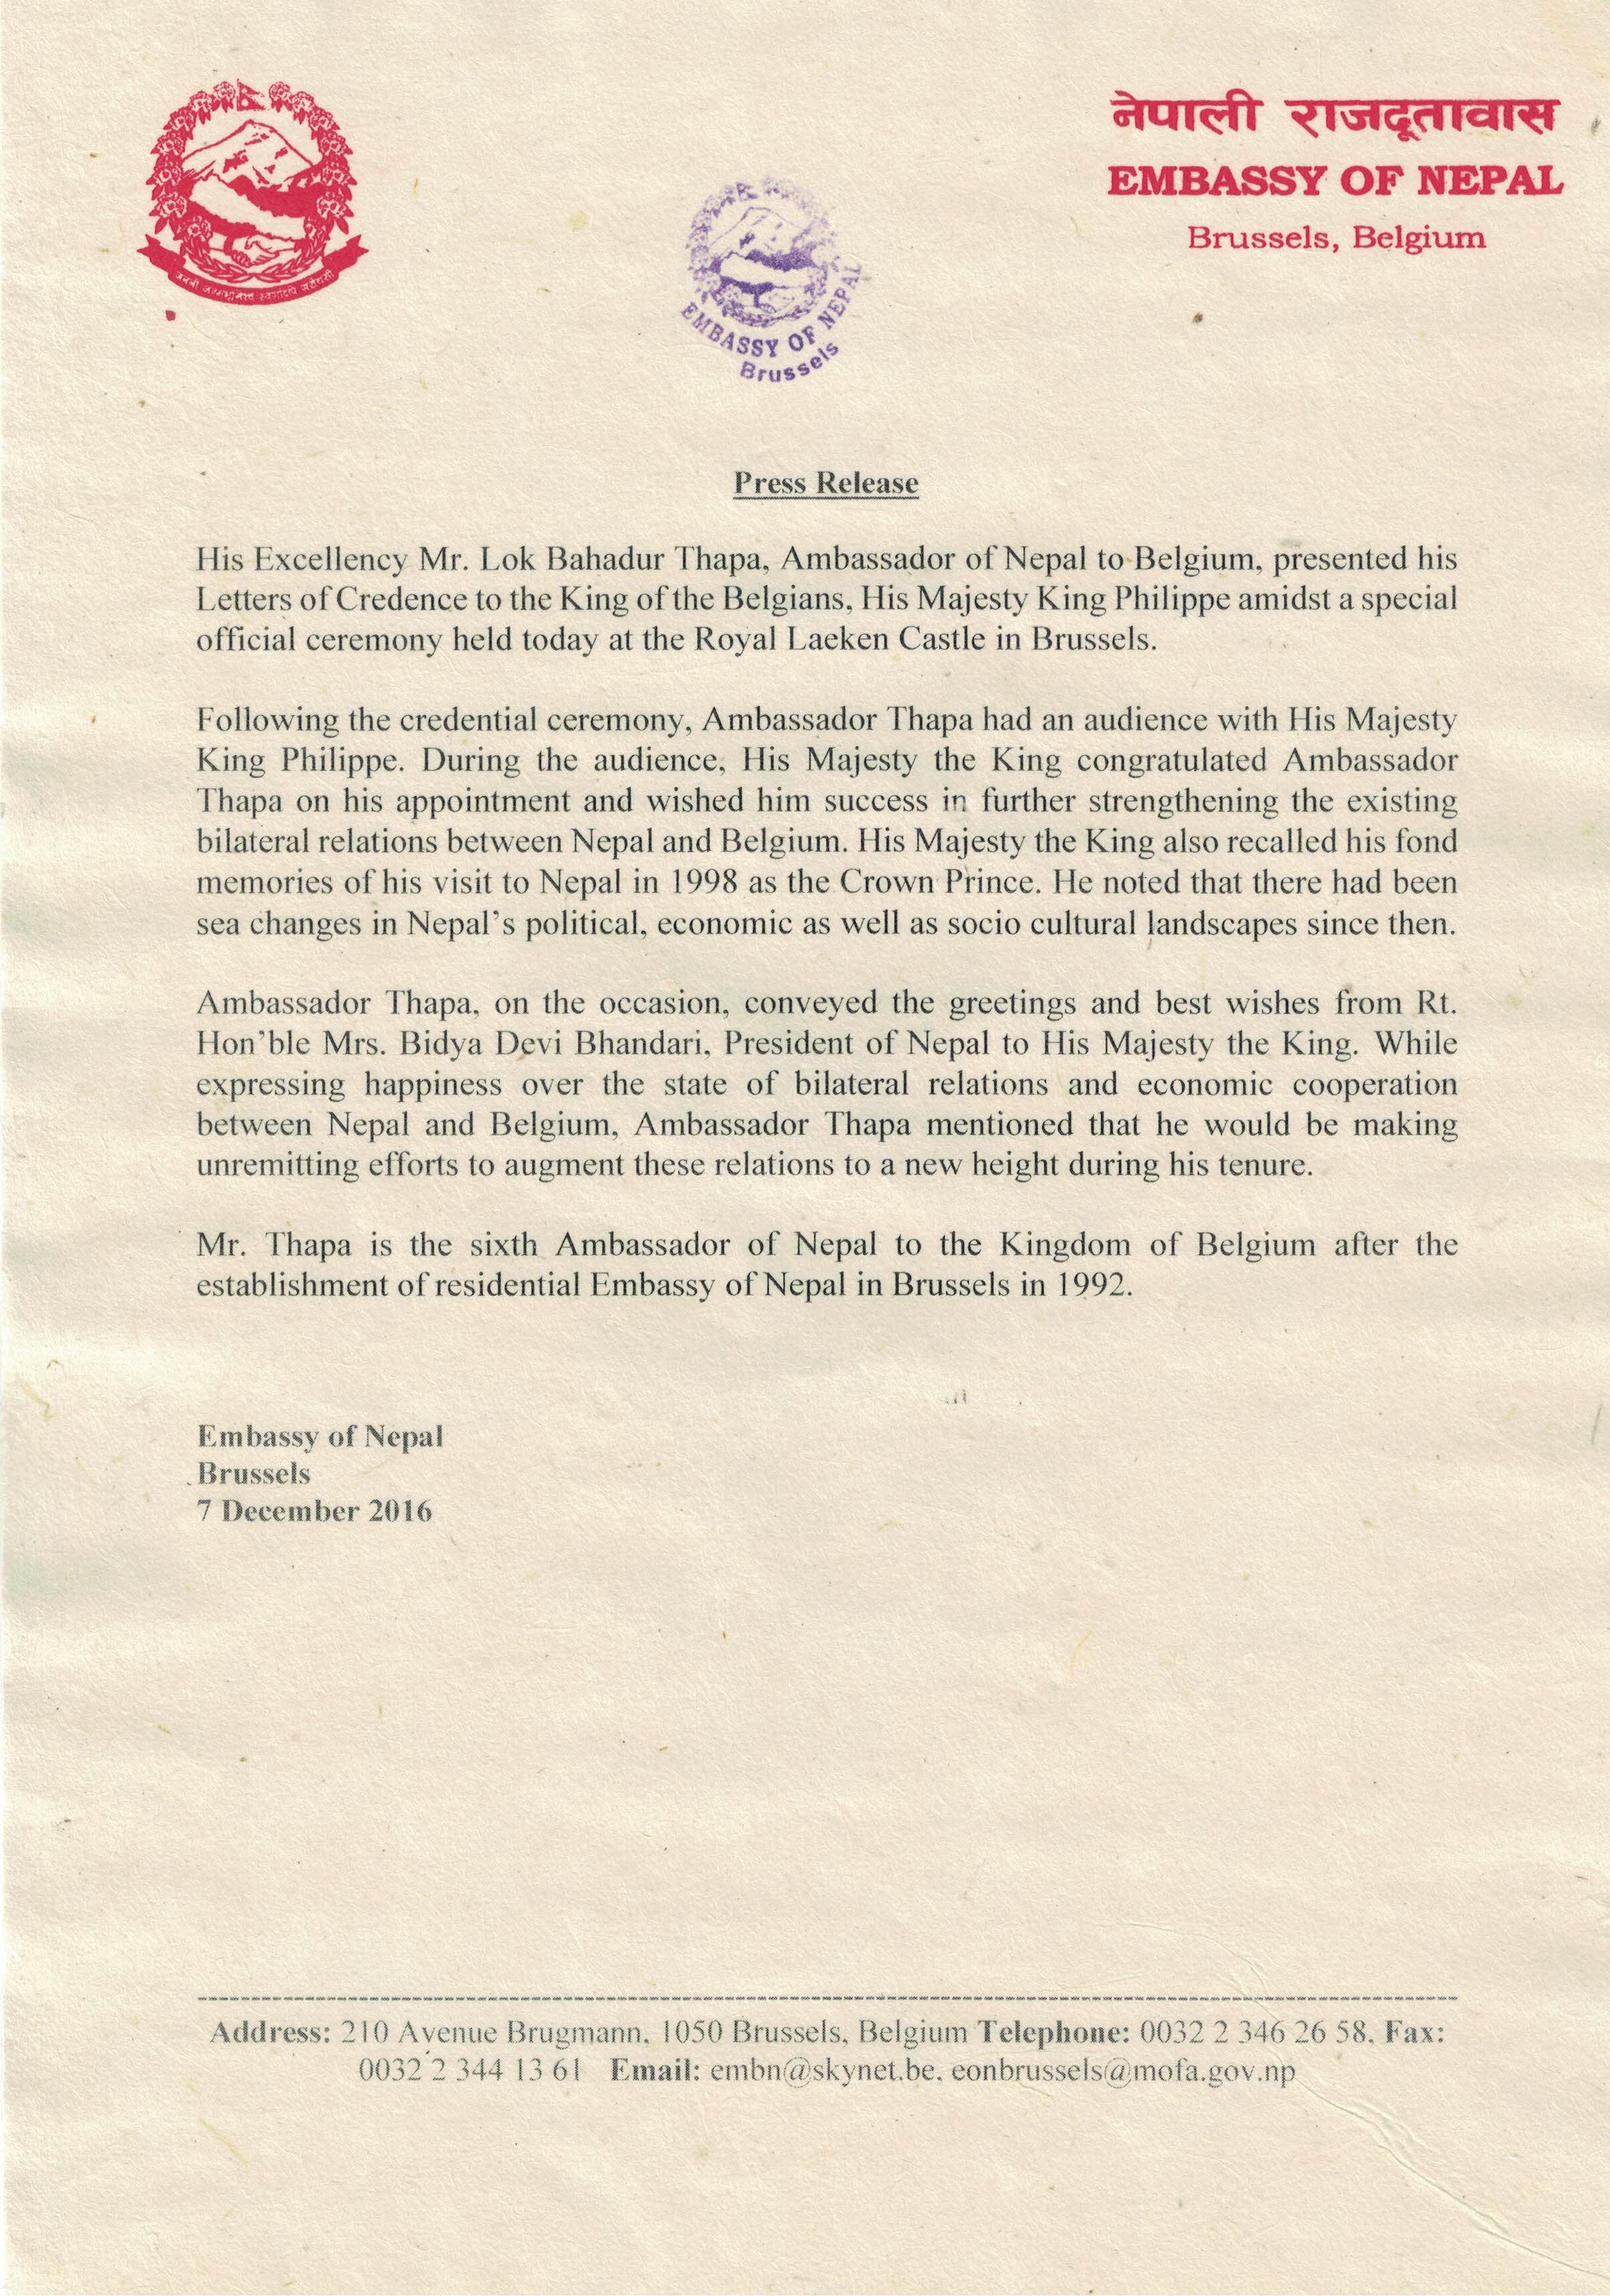 credentail-presentation-of-he-lok-bahadur-thapa